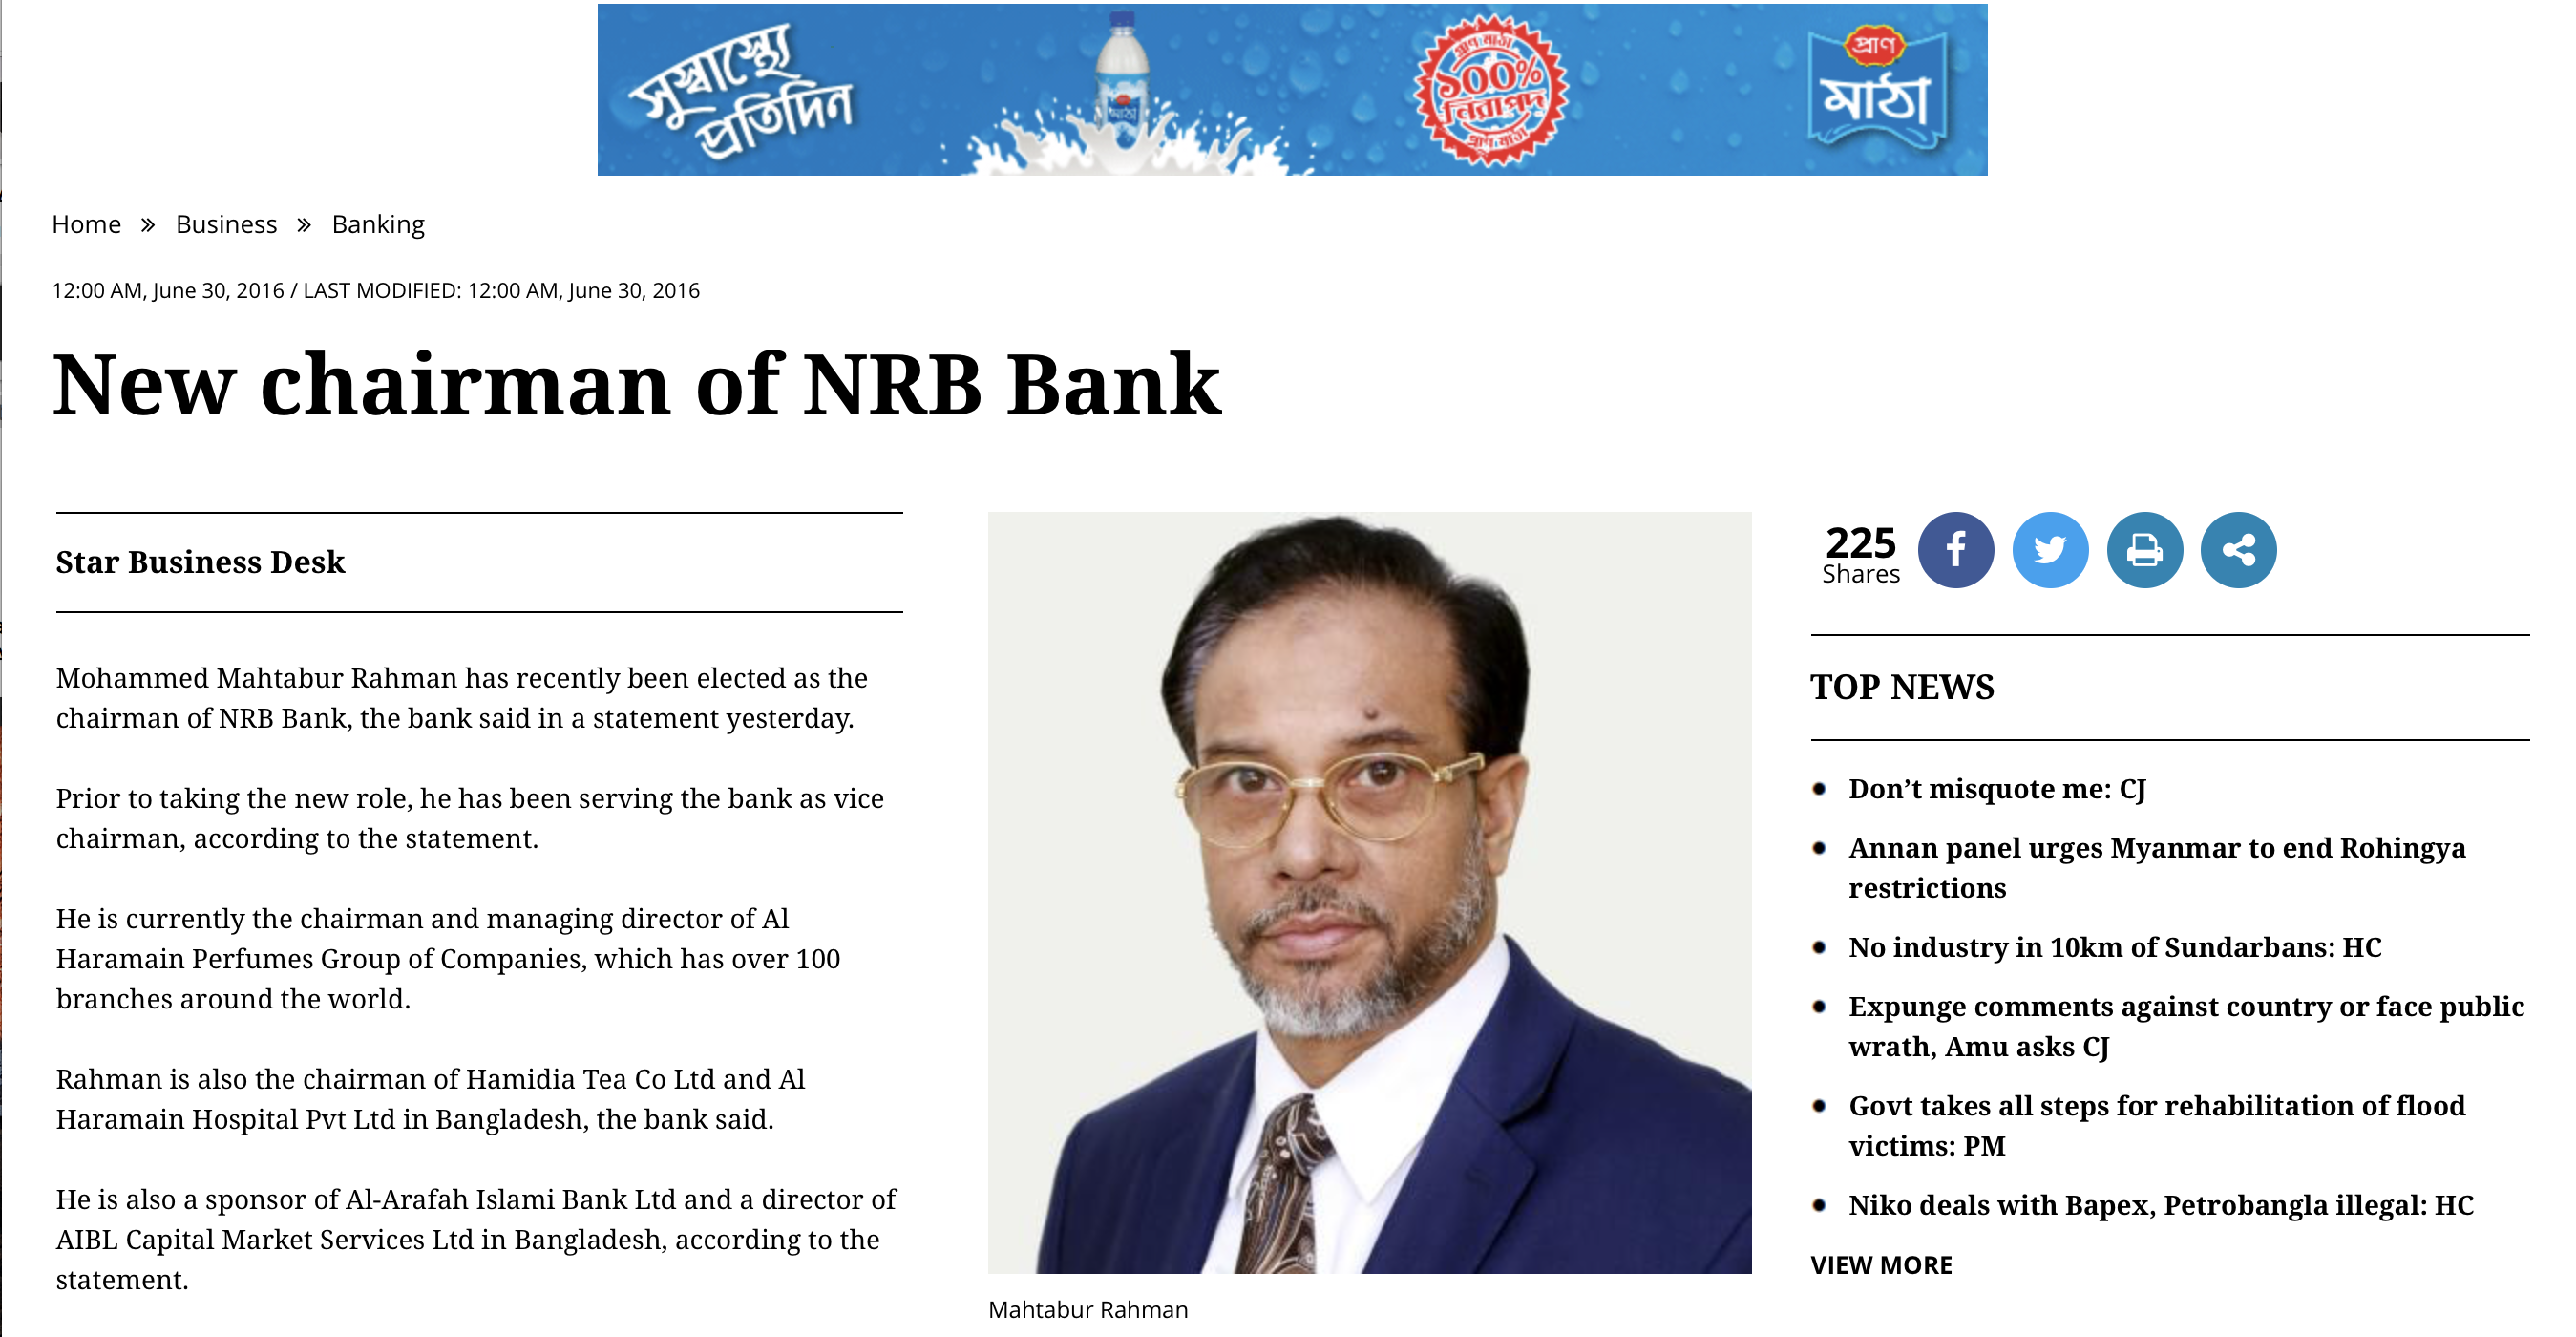 Mahtabur Rahman New Chairman NRB Bank 2016